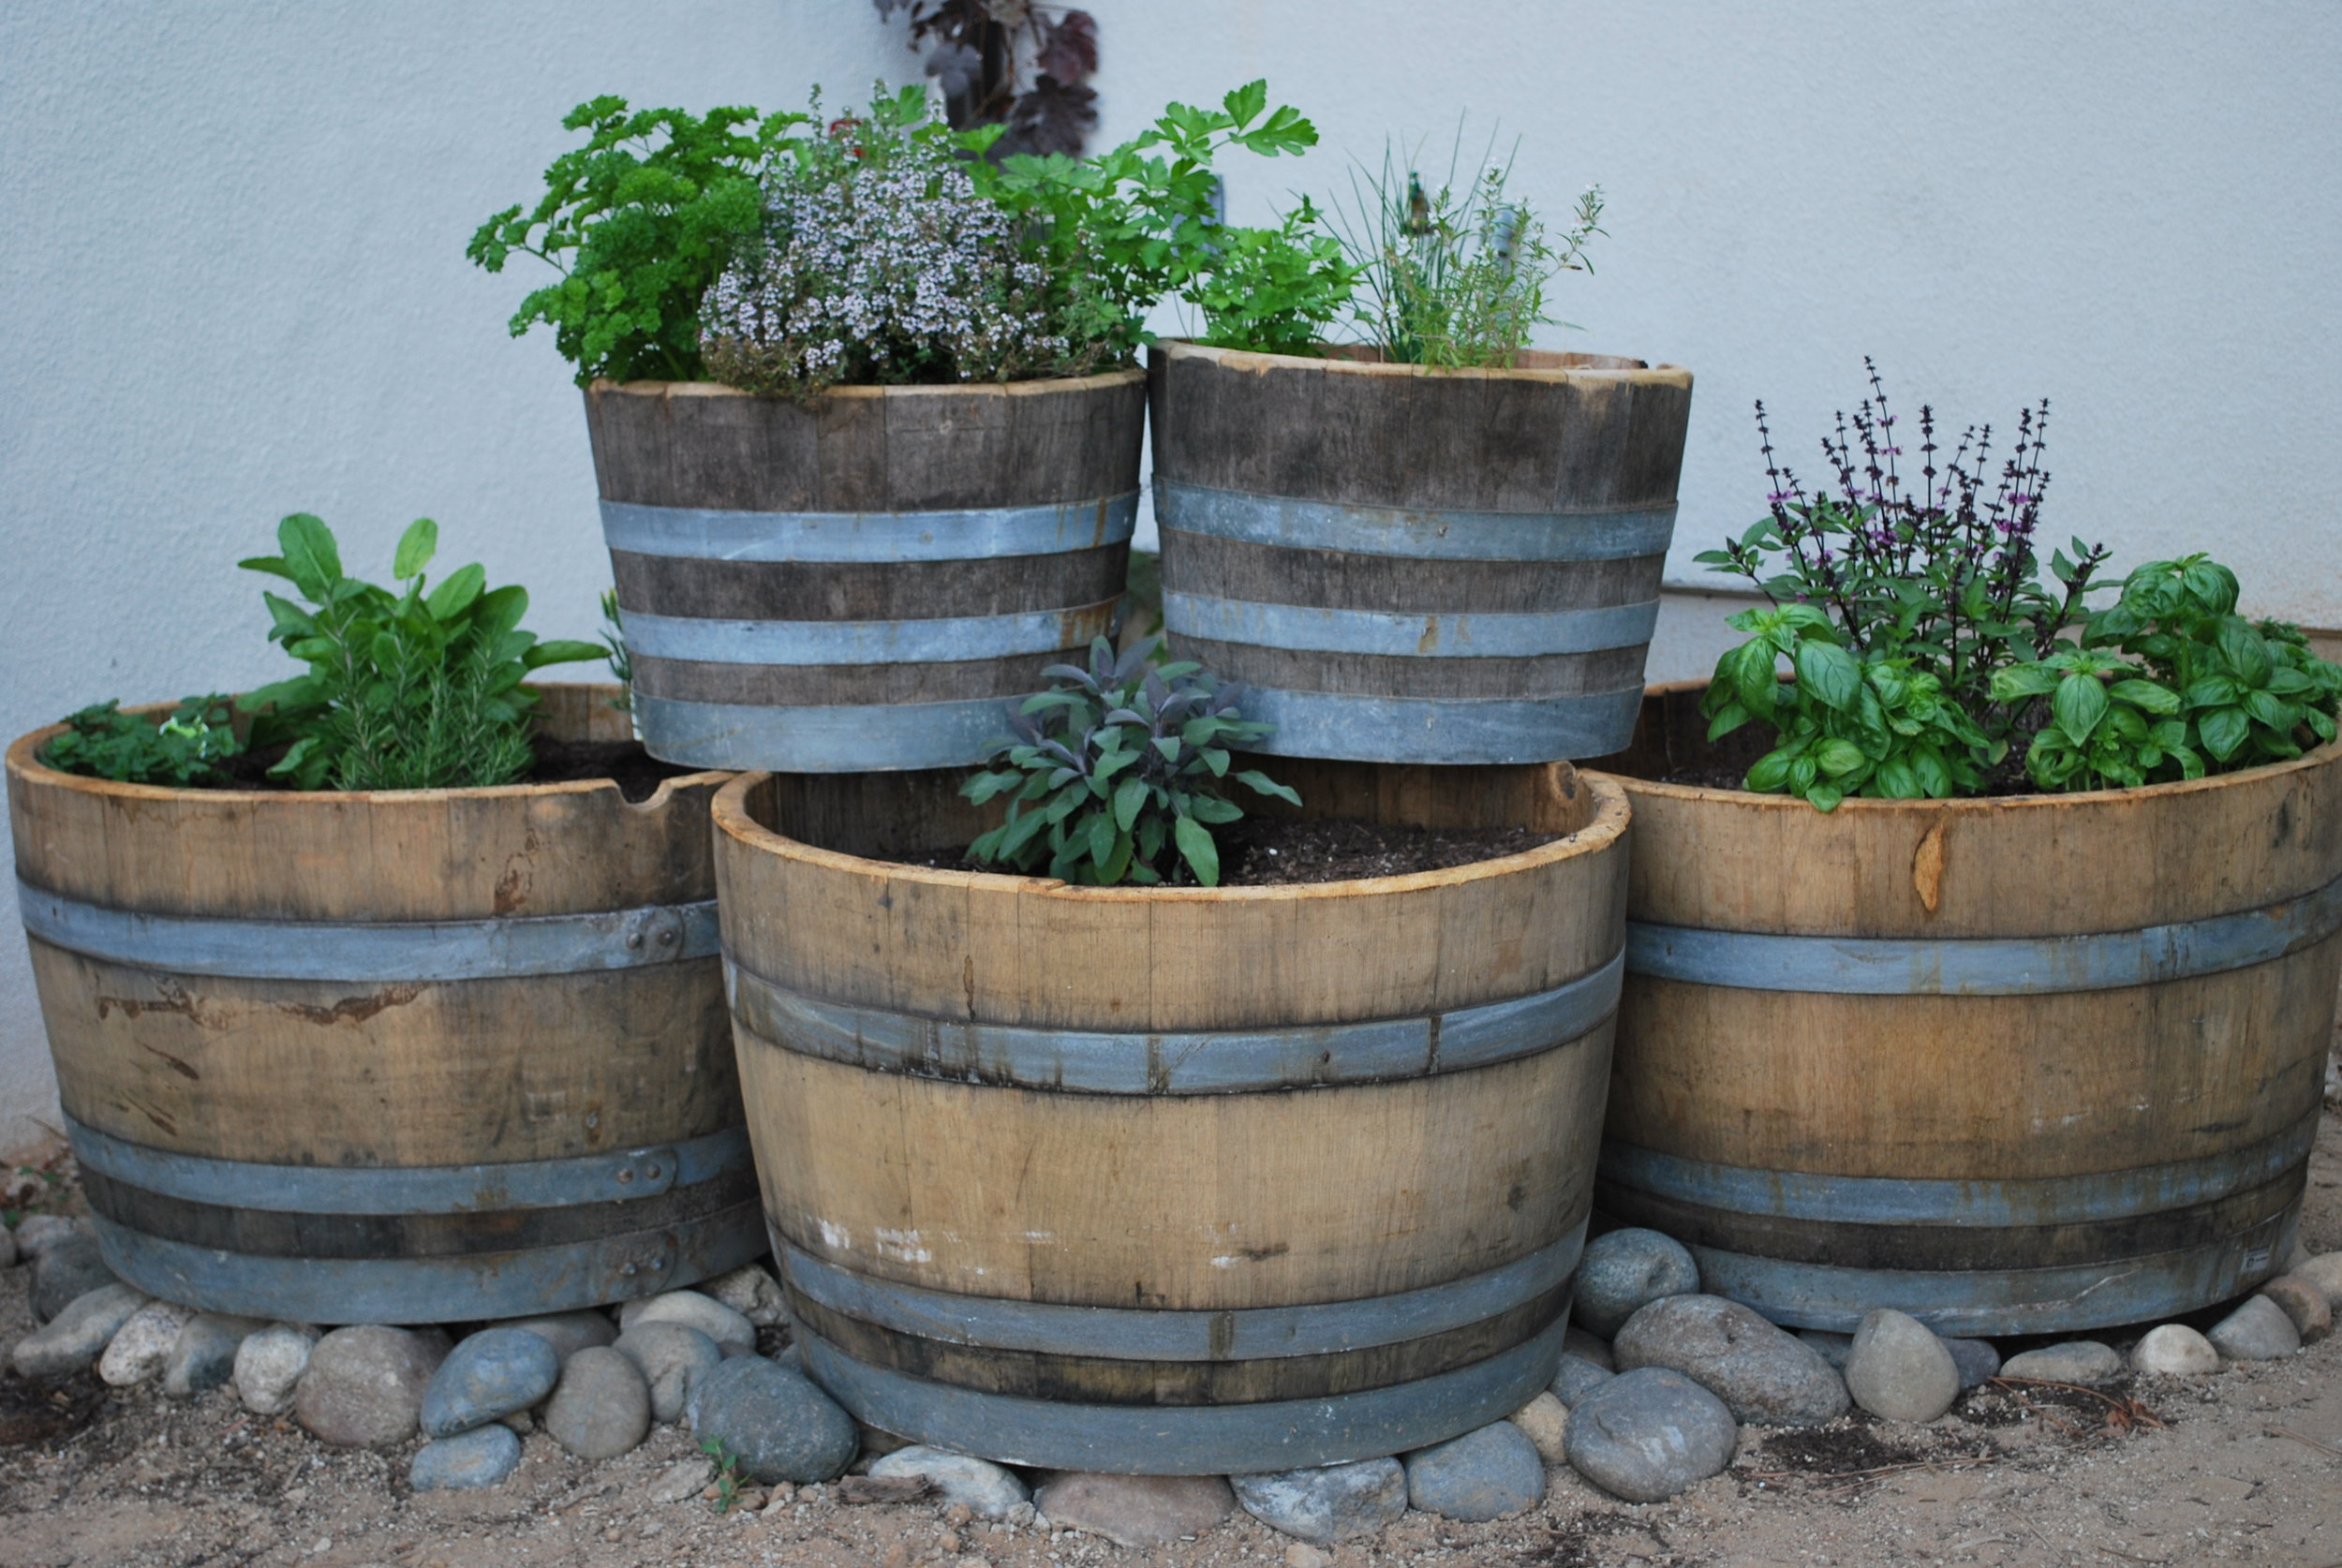 culinary herbs in barrels.jpg